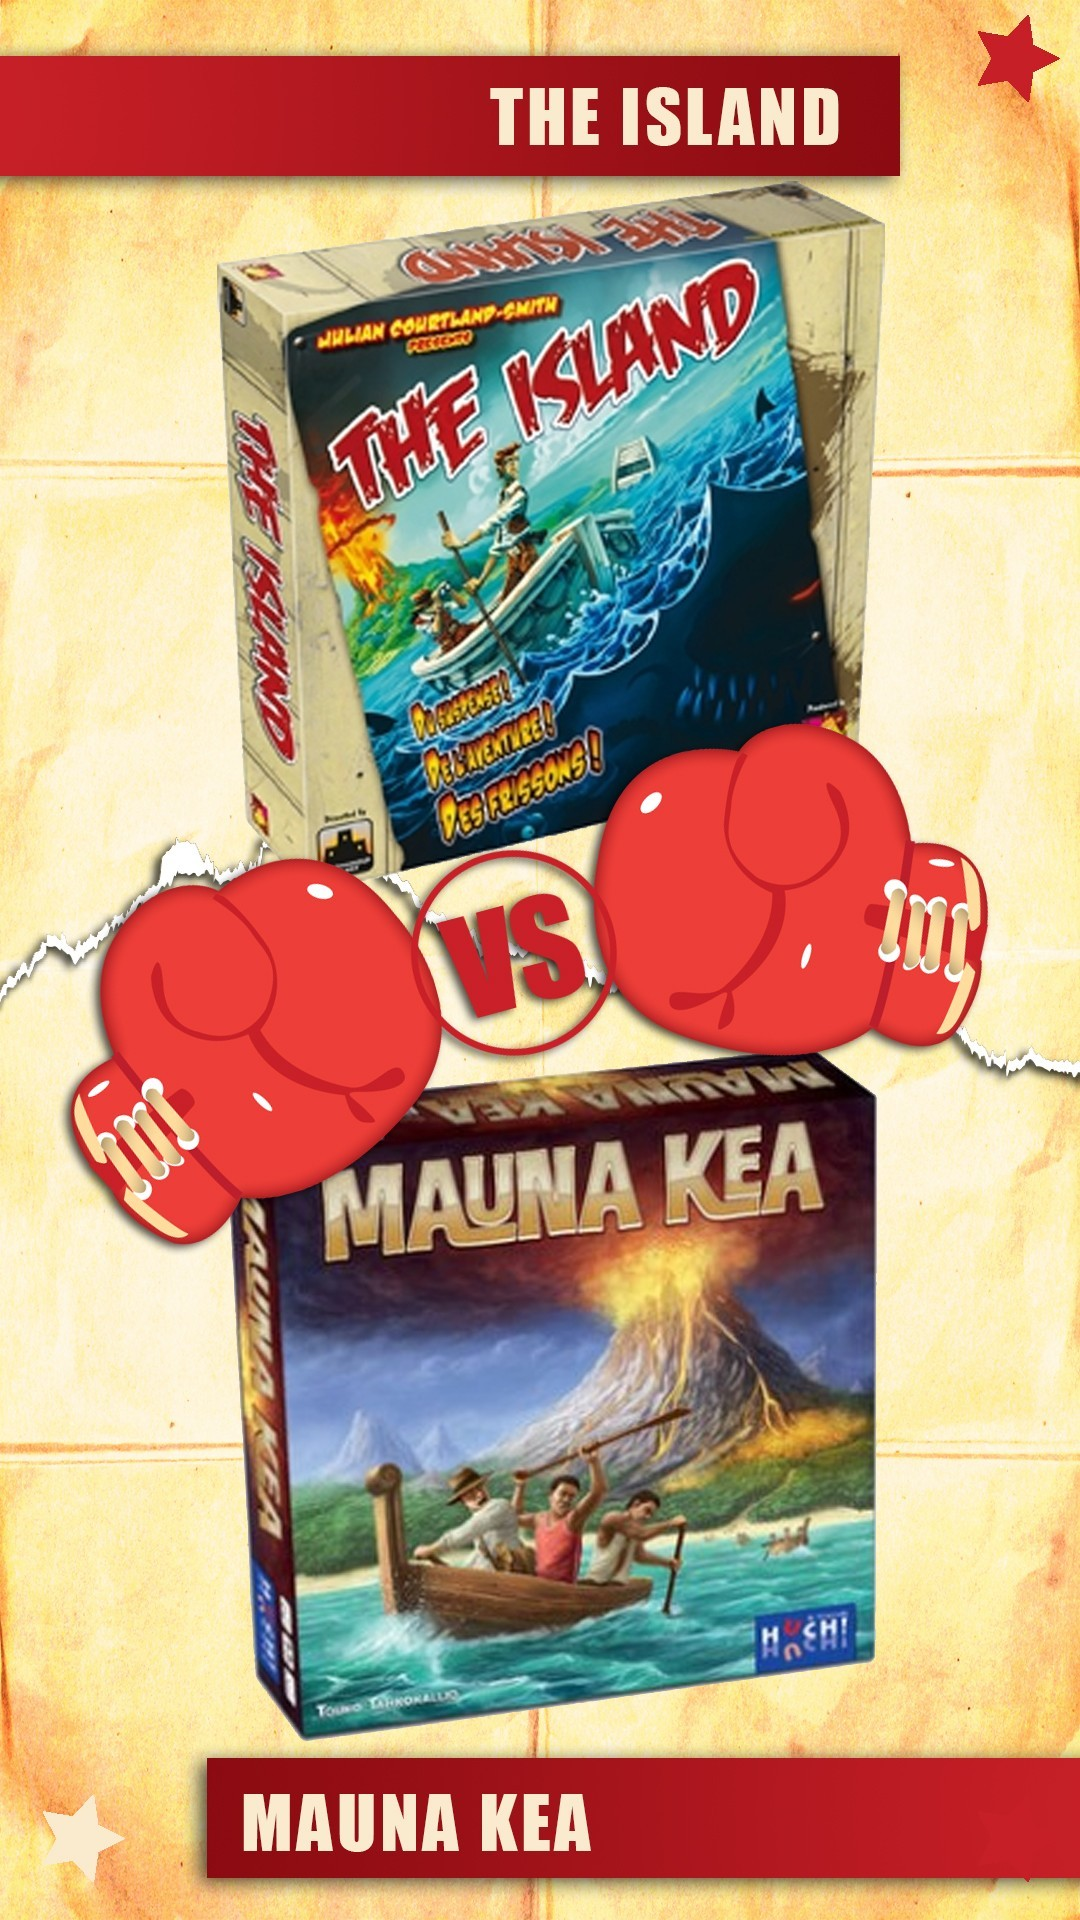 versus : the island vs mauna kea